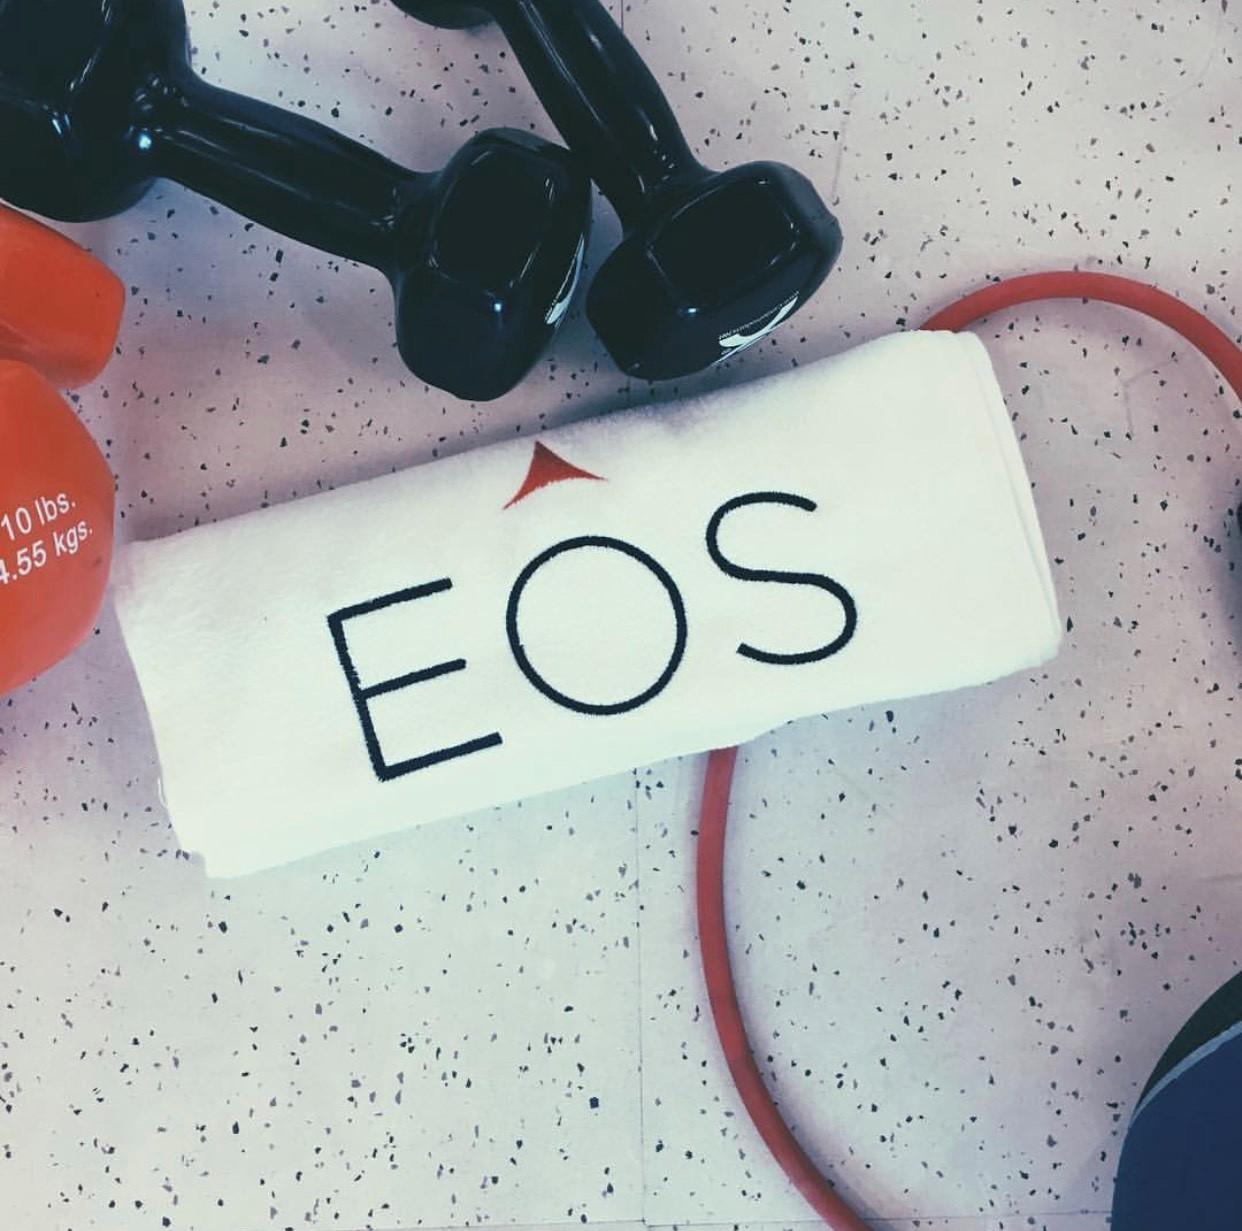 EOS branded towels